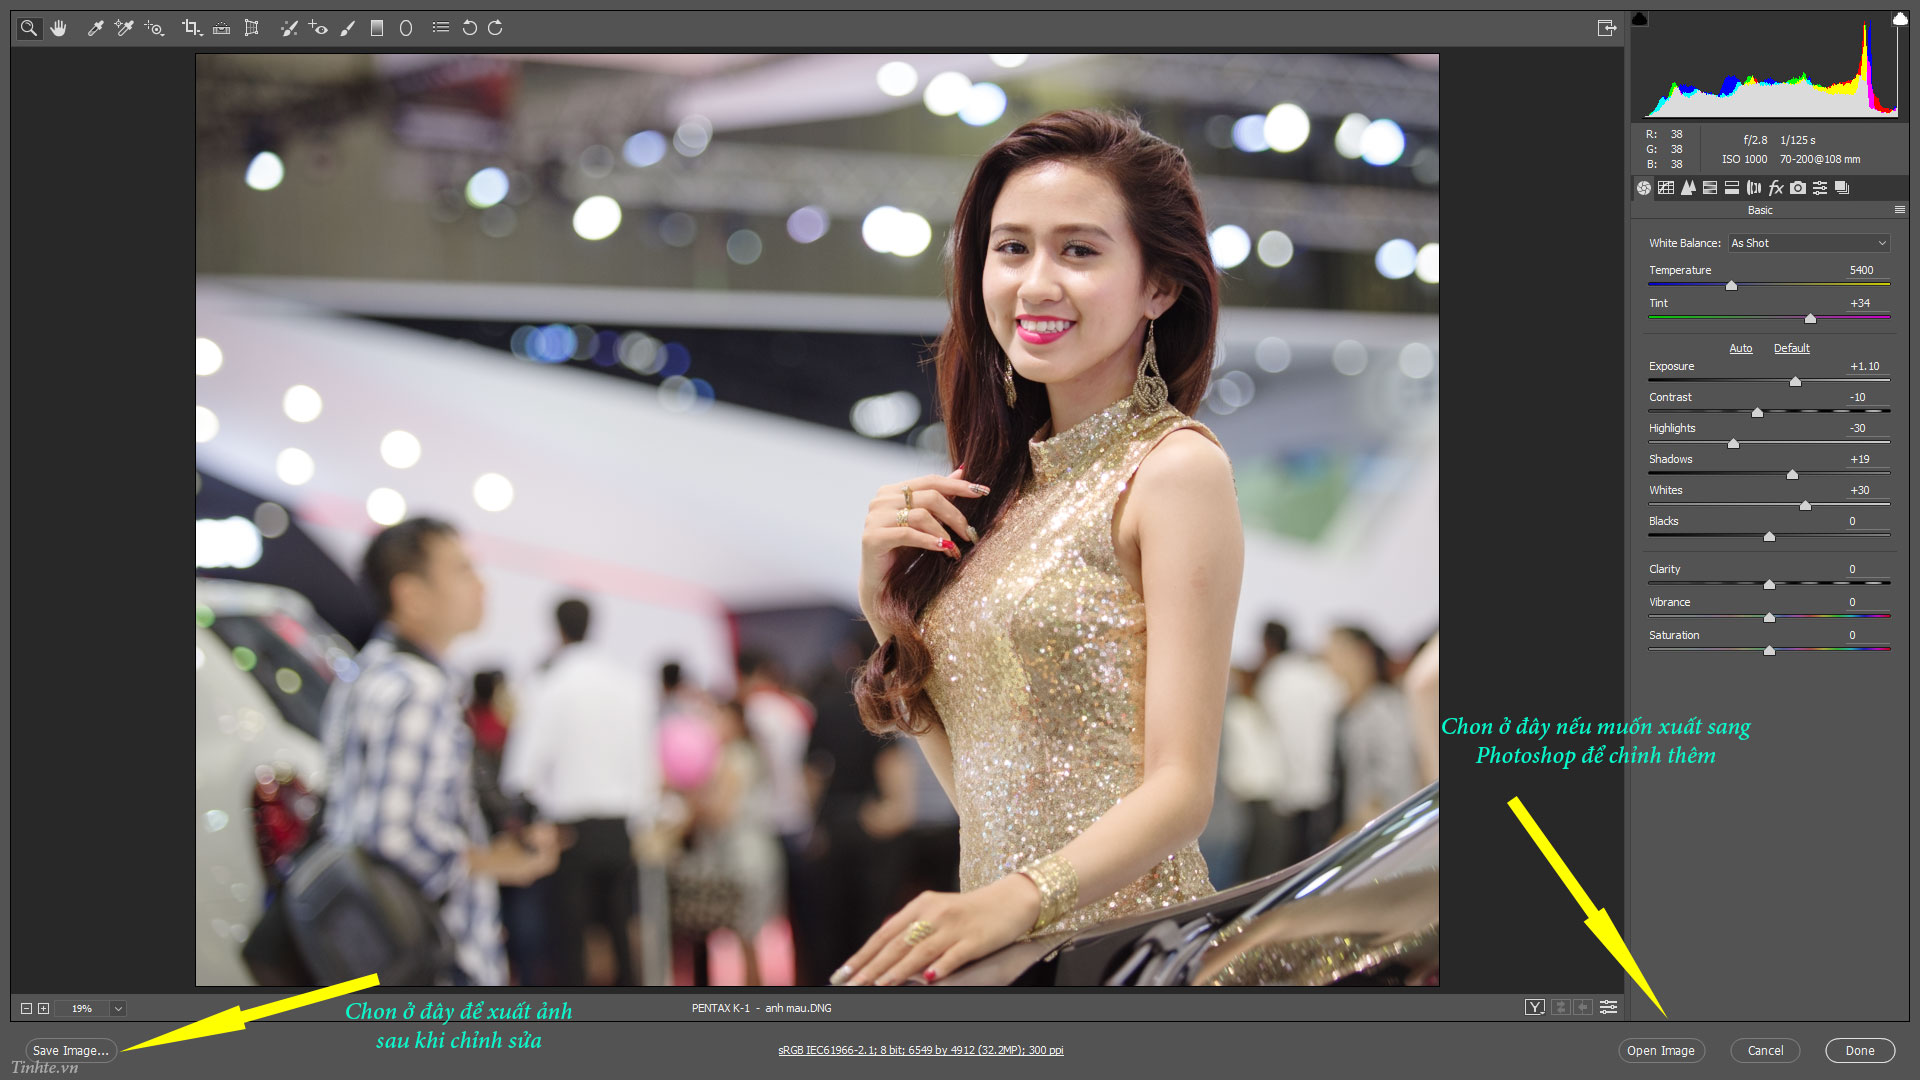 Lam_anh_sang_ro_trong_treo_hon_tinhte.vn_07.jpg